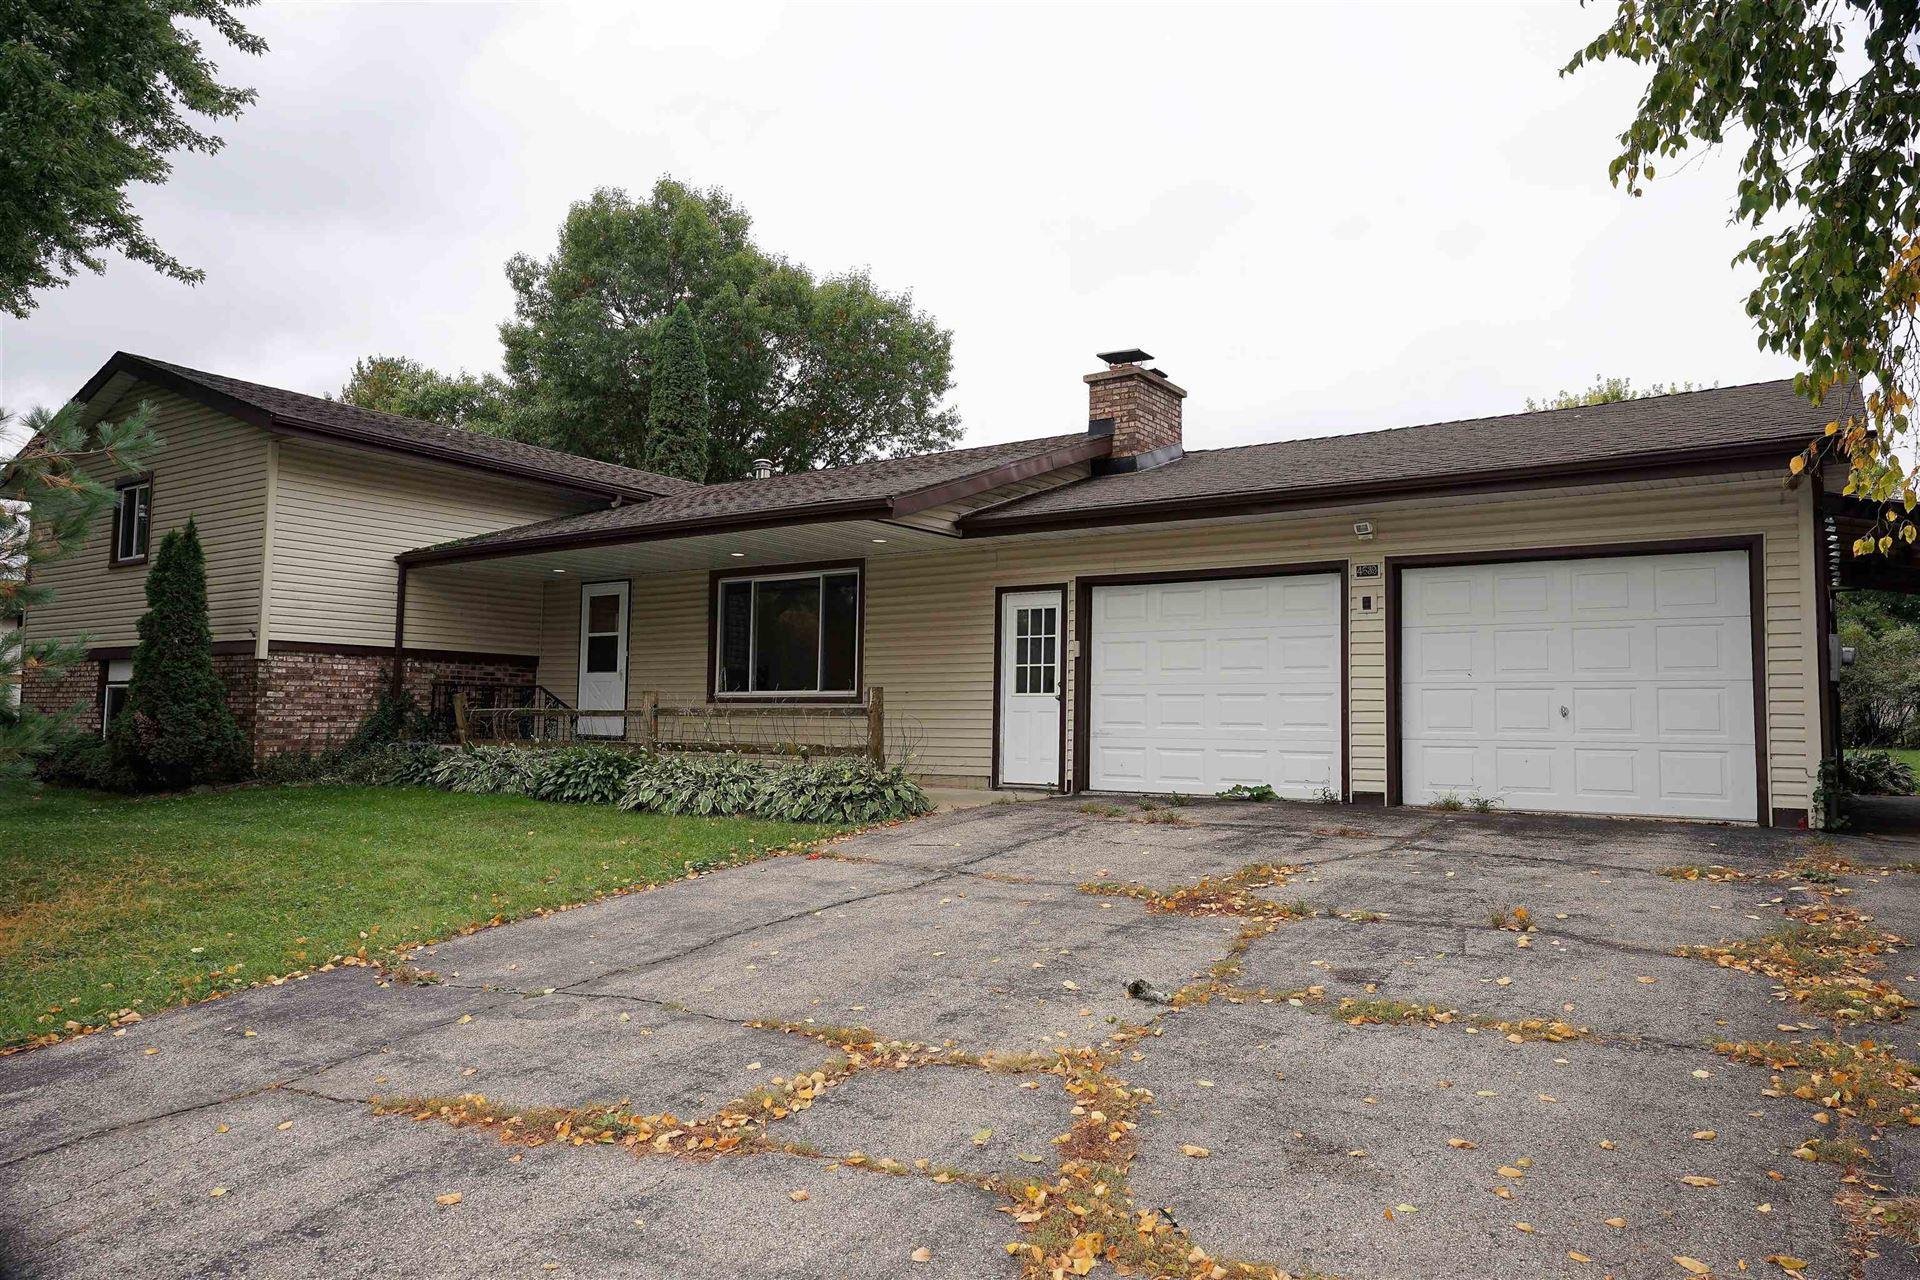 4639 Meadowlark St, Cottage Grove, WI 53527 - #: 1921276